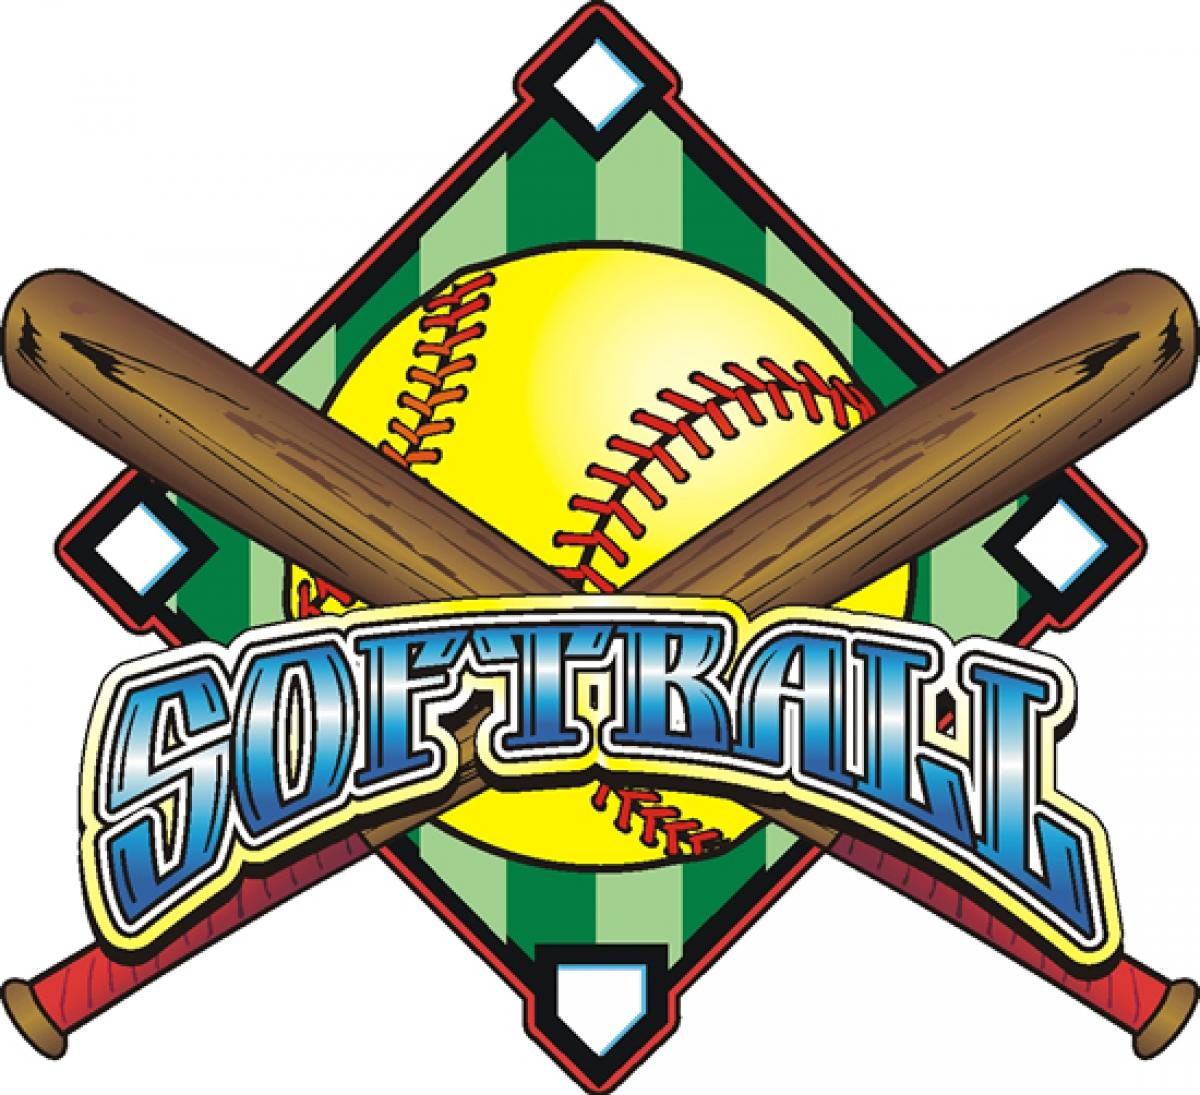 Softball clipart softball league. Adult summer registration deadline